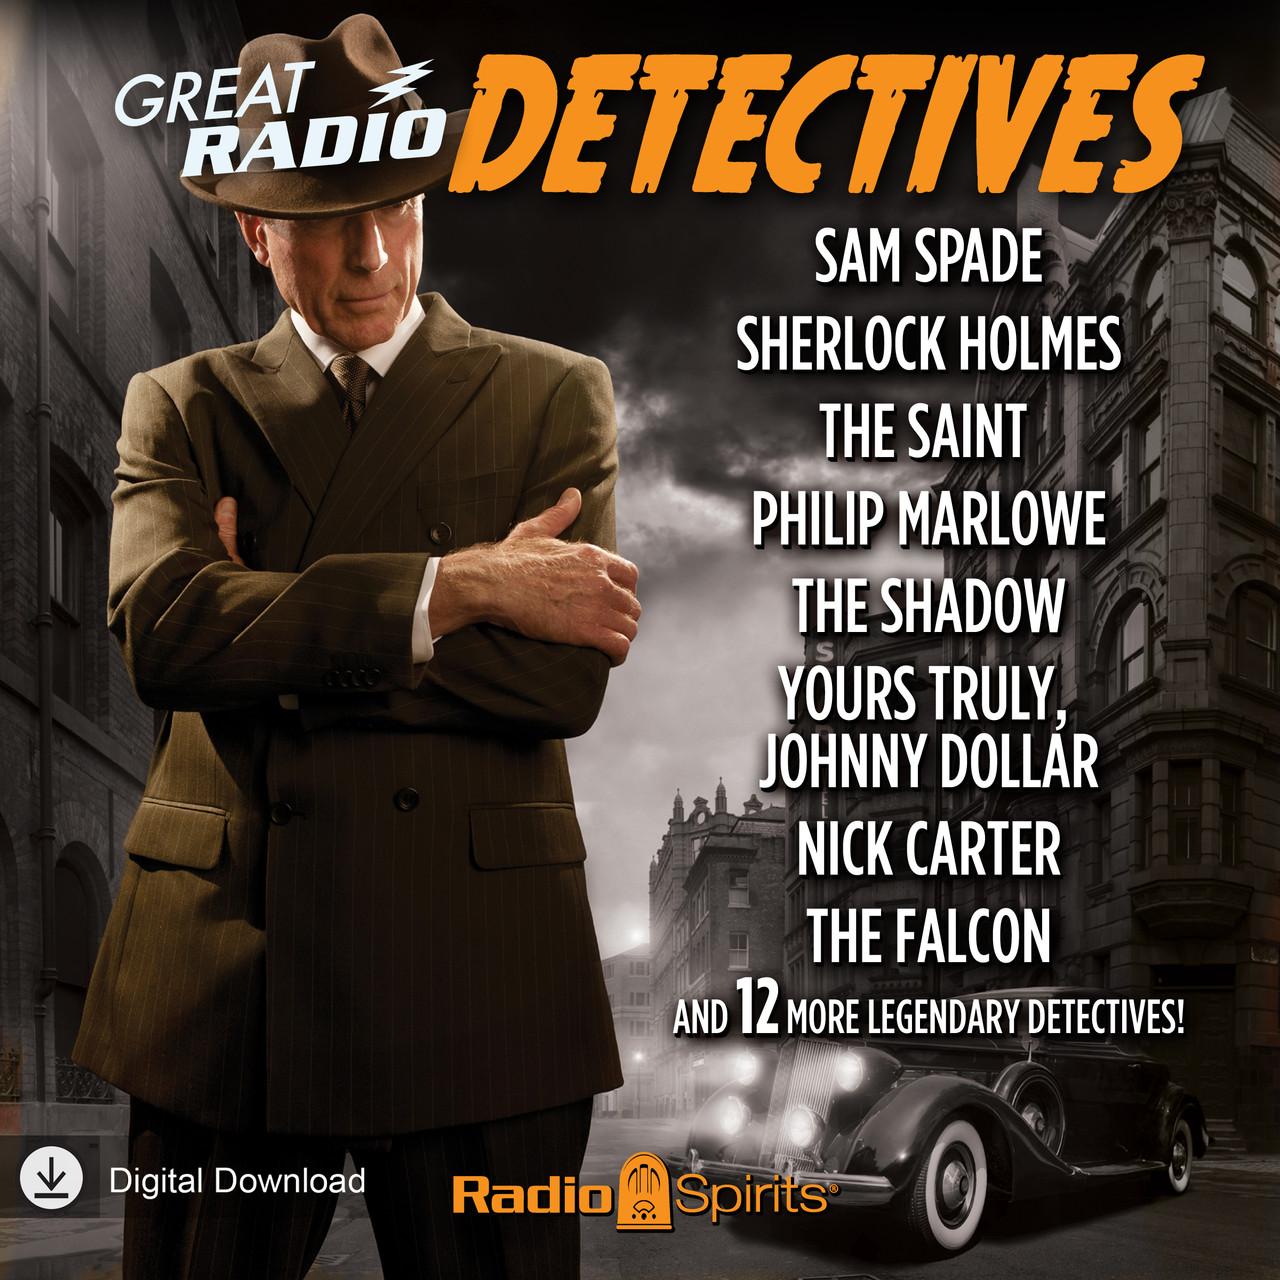 Great Radio Detectives (MP3 Download)